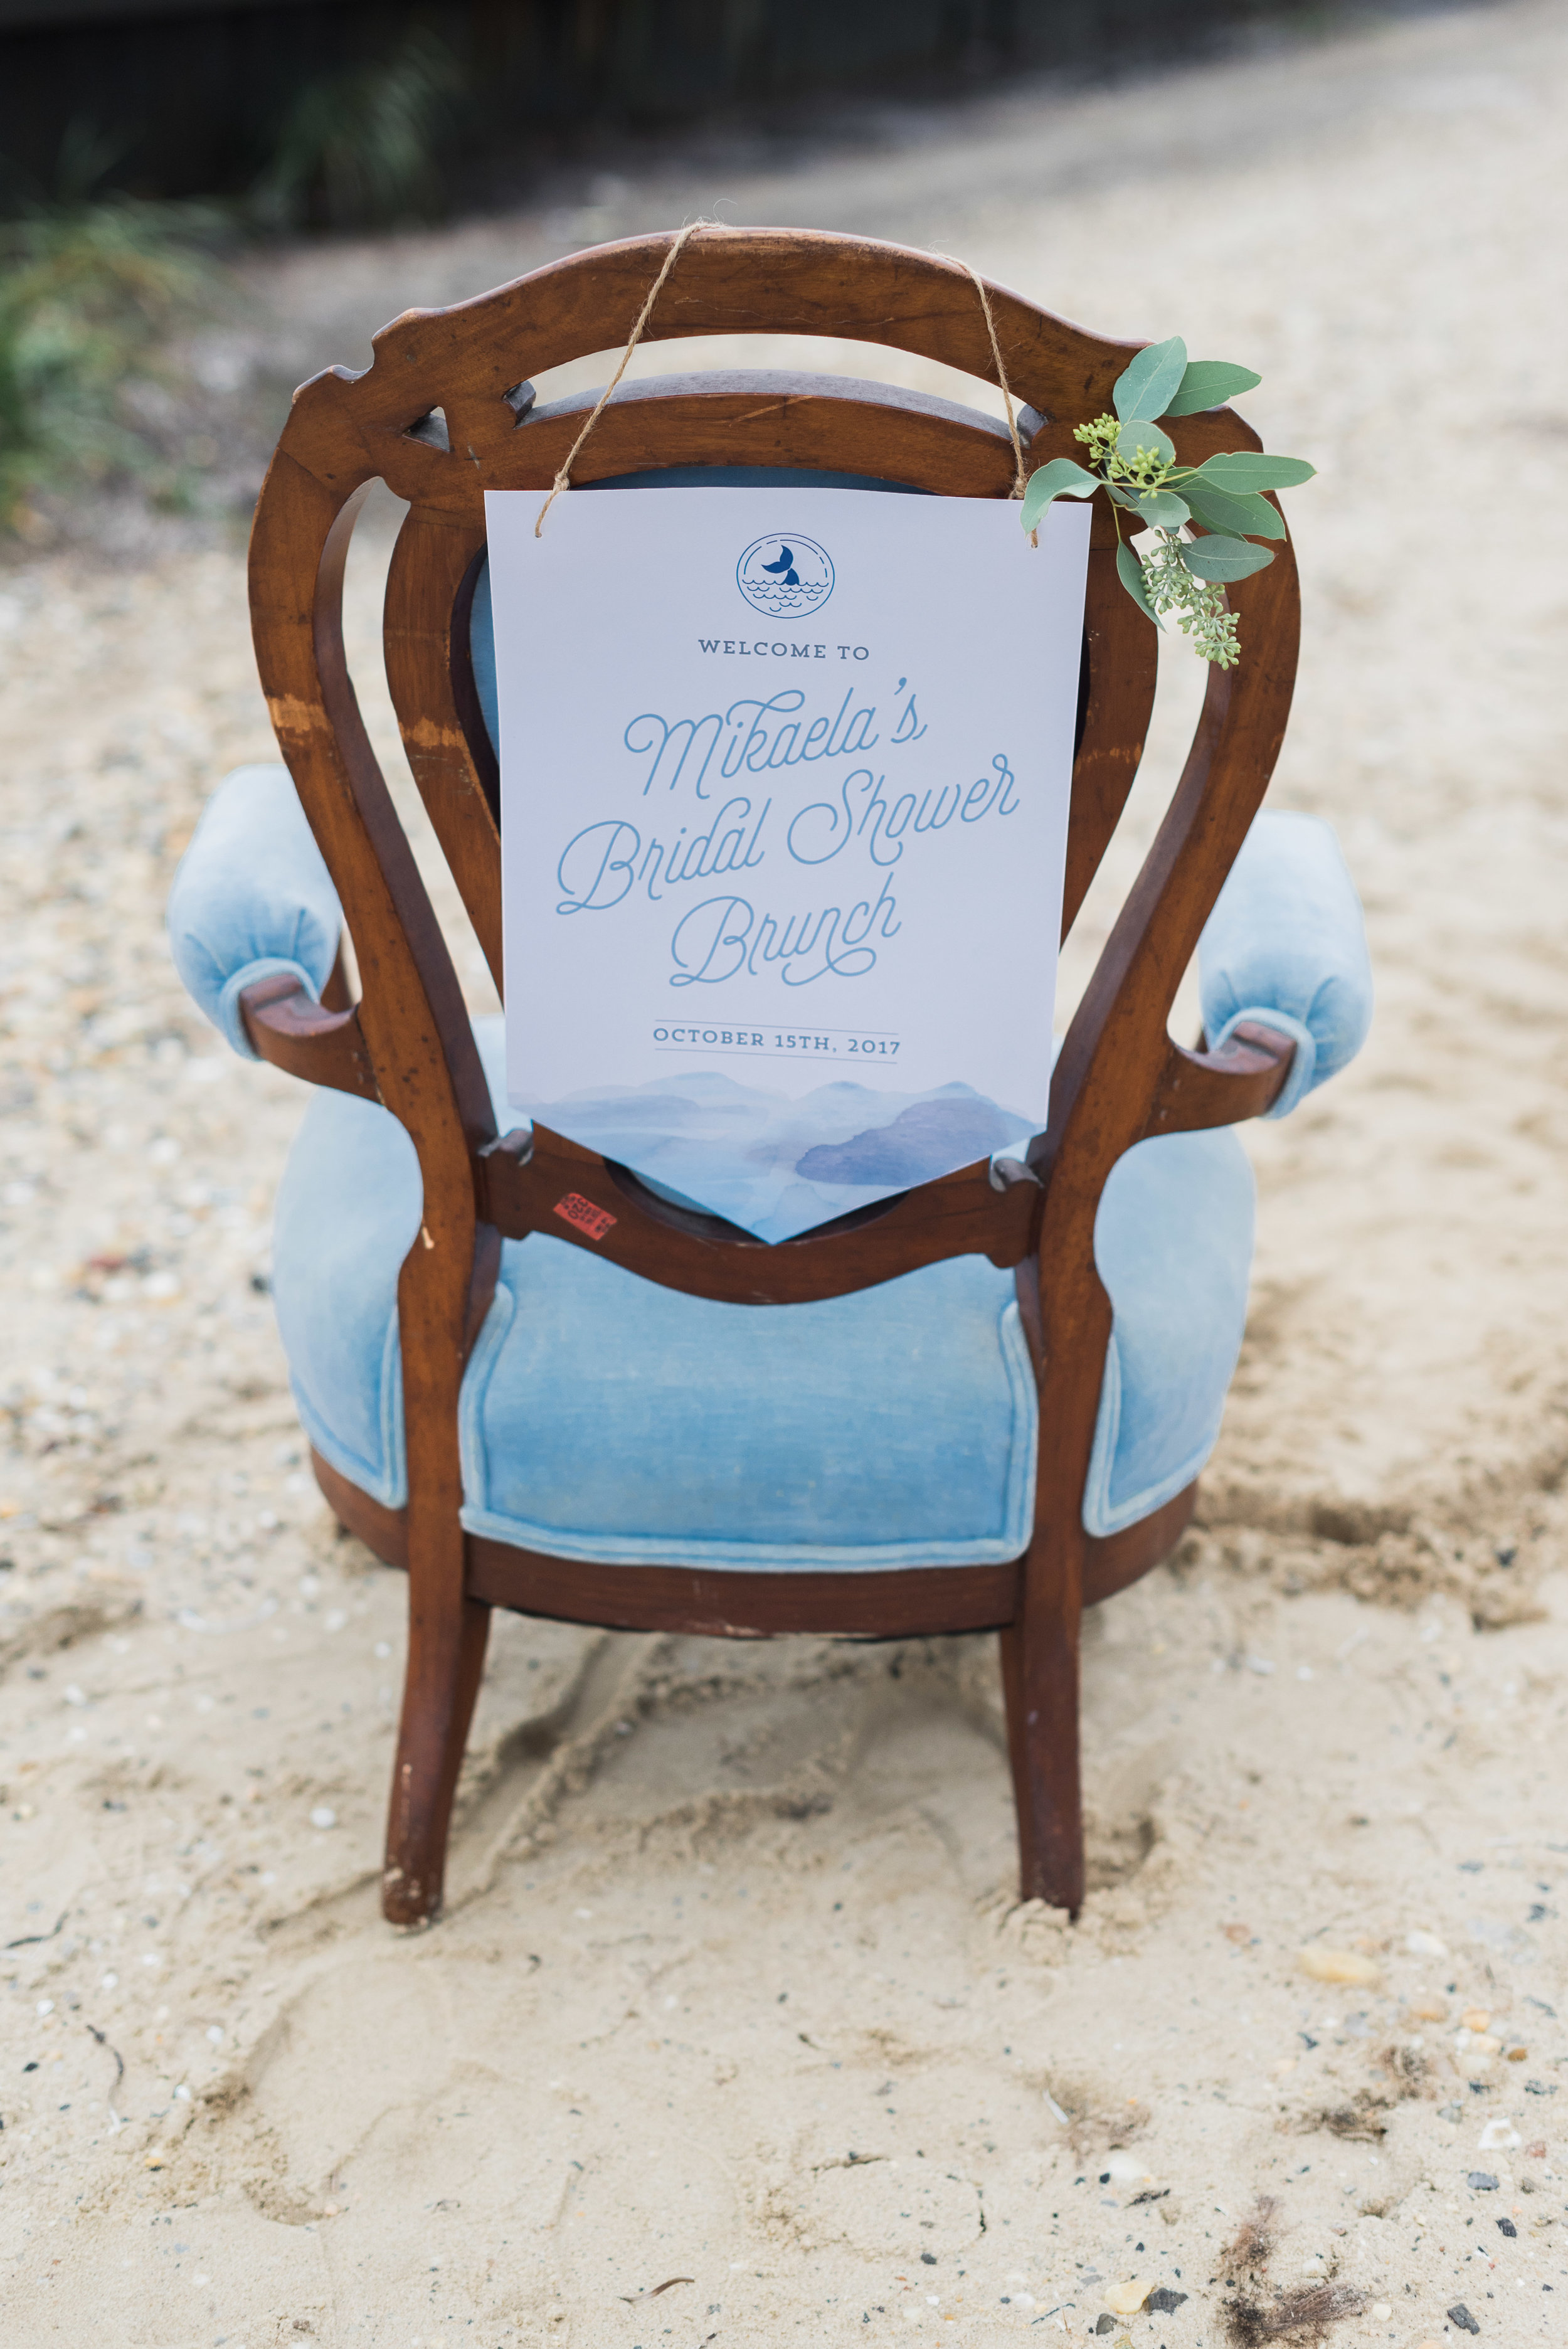 Tessie_Reveliotis_Photography_MermaidShoot-57.jpgmermaid watercolor bridal shower brunch